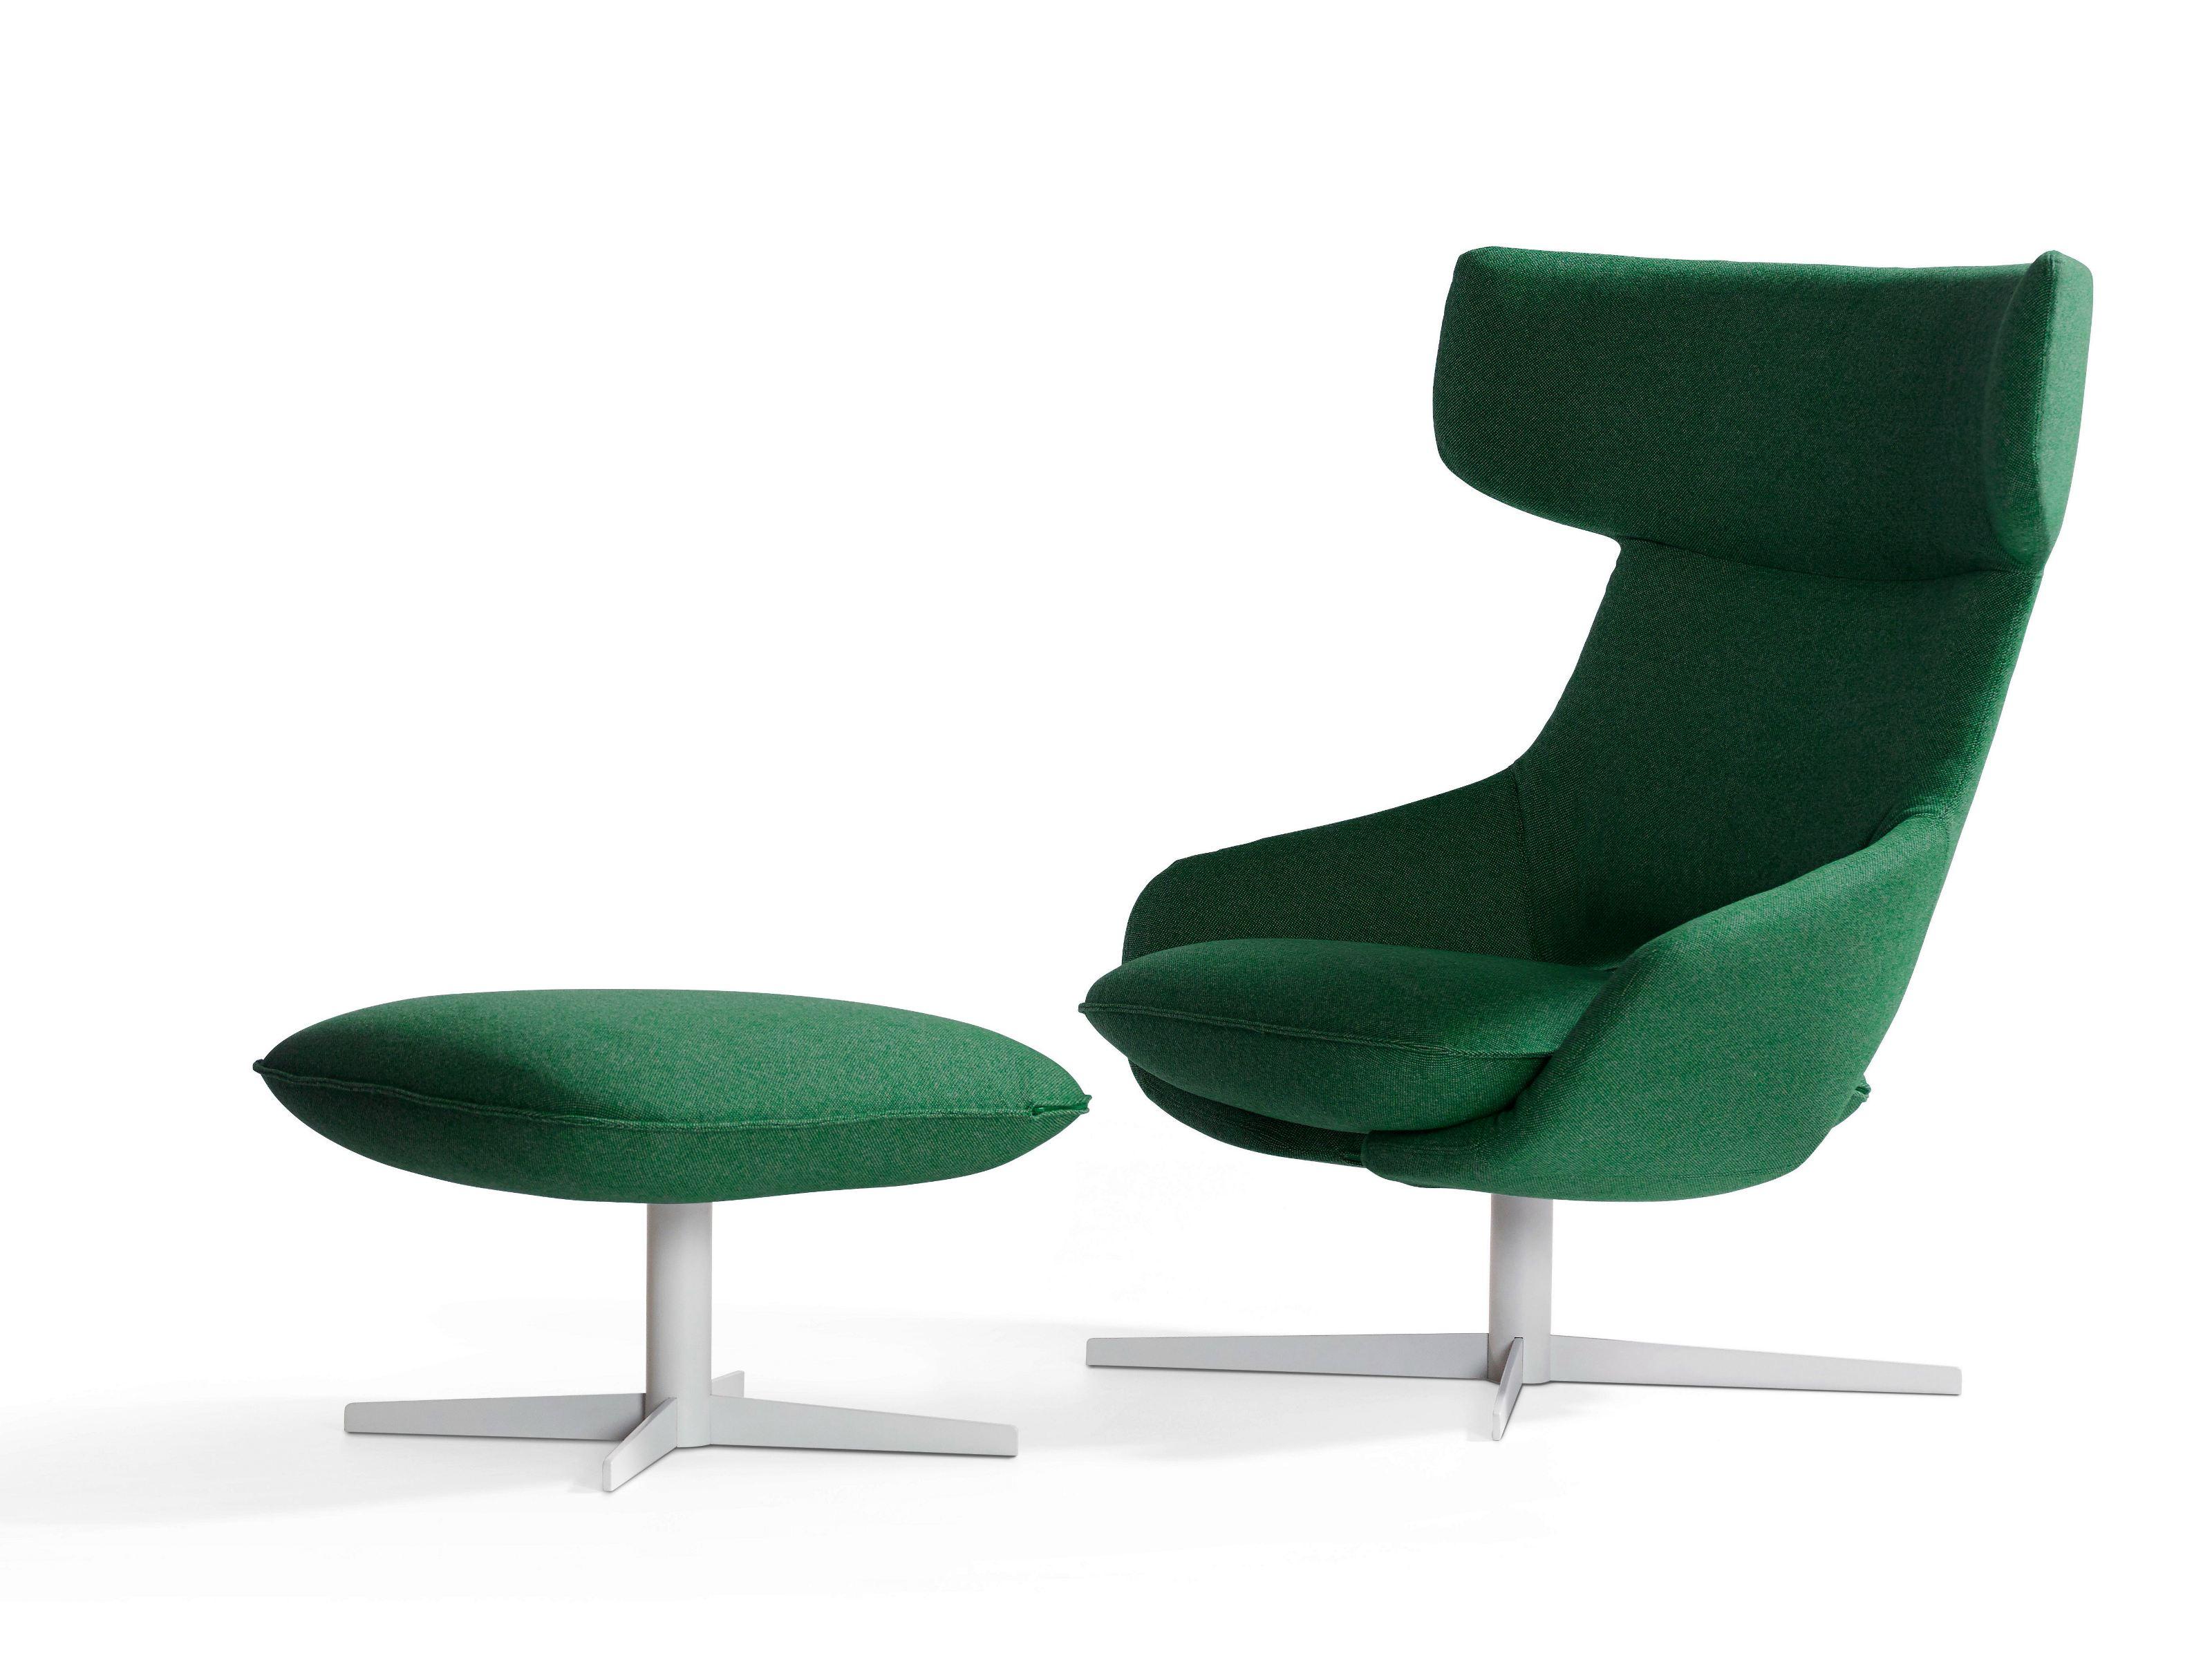 kalm swivel armchair by patrick norguet for artifort  sohomod blog -  kalm swivel armchair  ottoman by patrick norguet for artifort